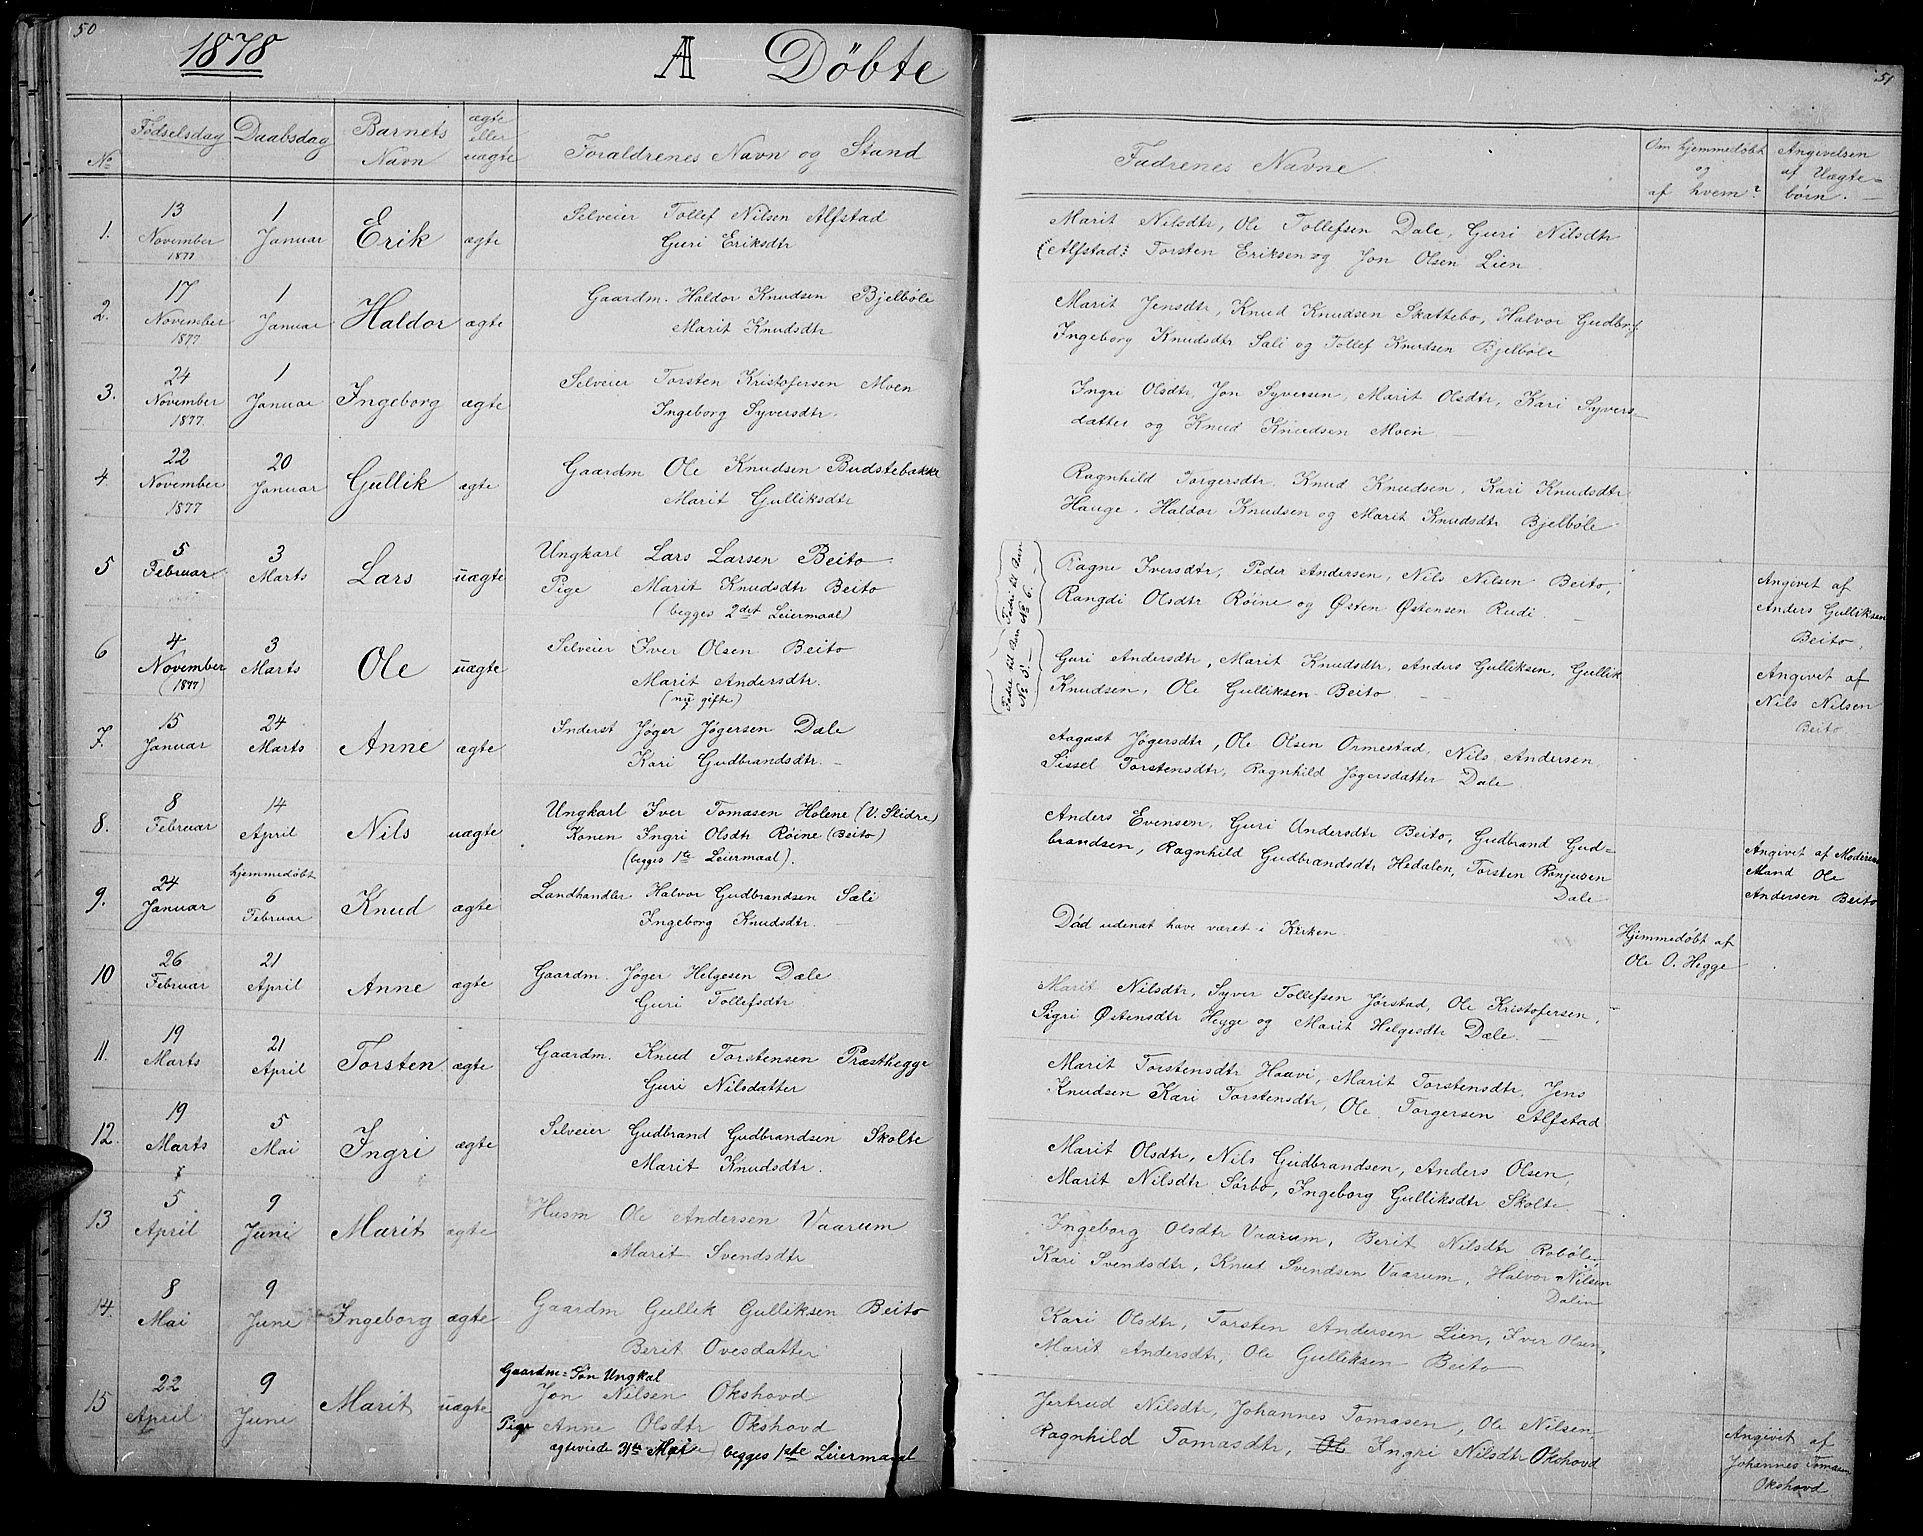 SAH, Øystre Slidre prestekontor, Klokkerbok nr. 1, 1866-1886, s. 50-51